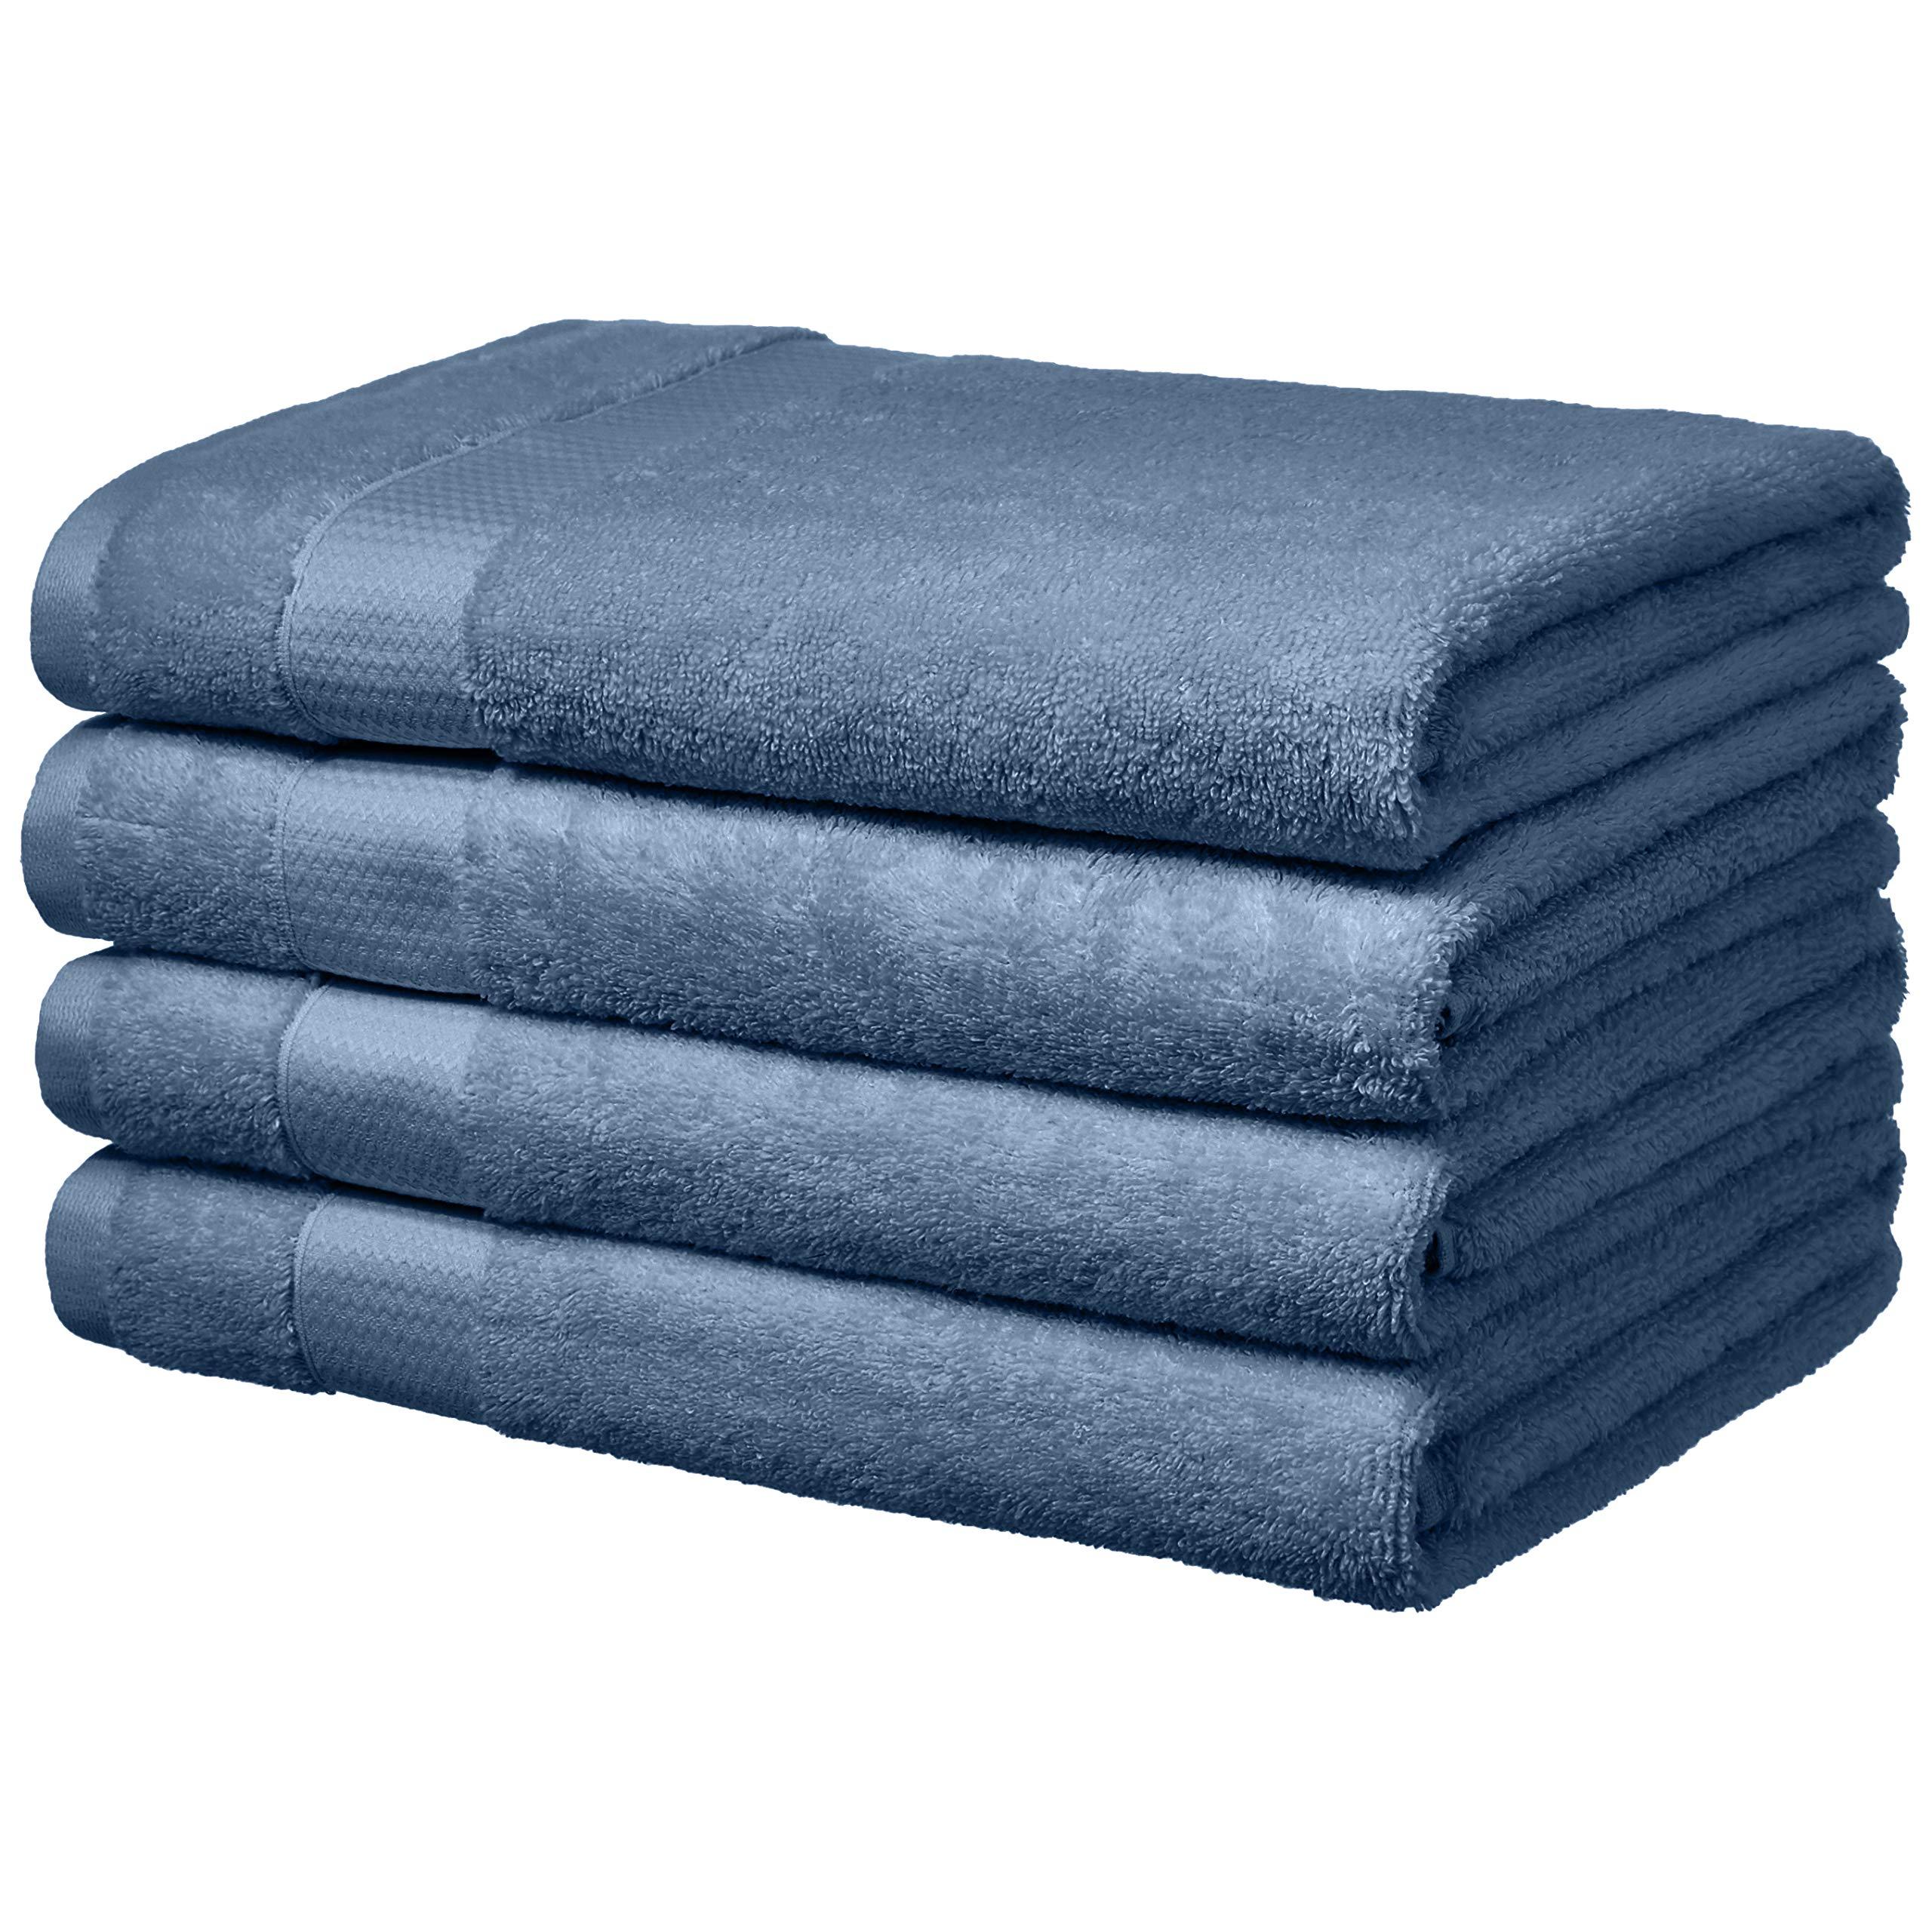 AmazonBasics Everyday Bath Towels - 4-Pack, Cornflower Blue